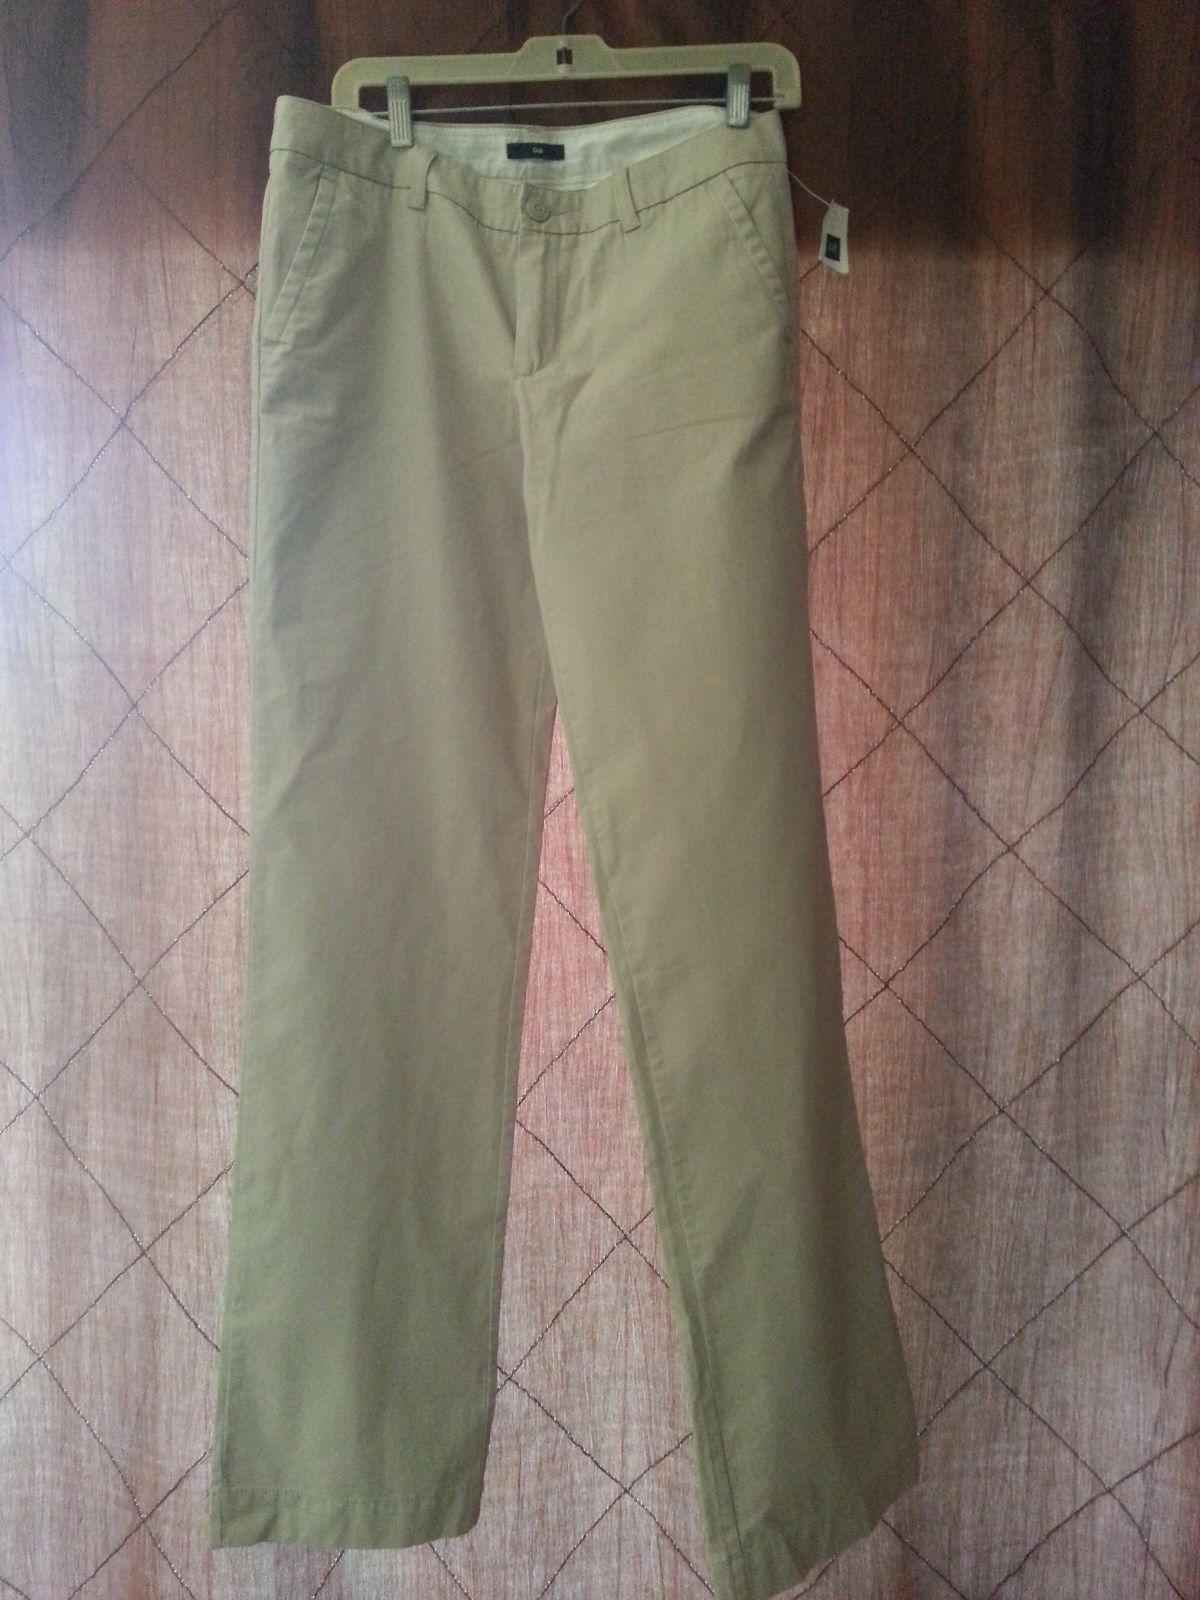 GAP NWT Womens Flat Front Beige Khaki Pants Size 4XLong - $14.50